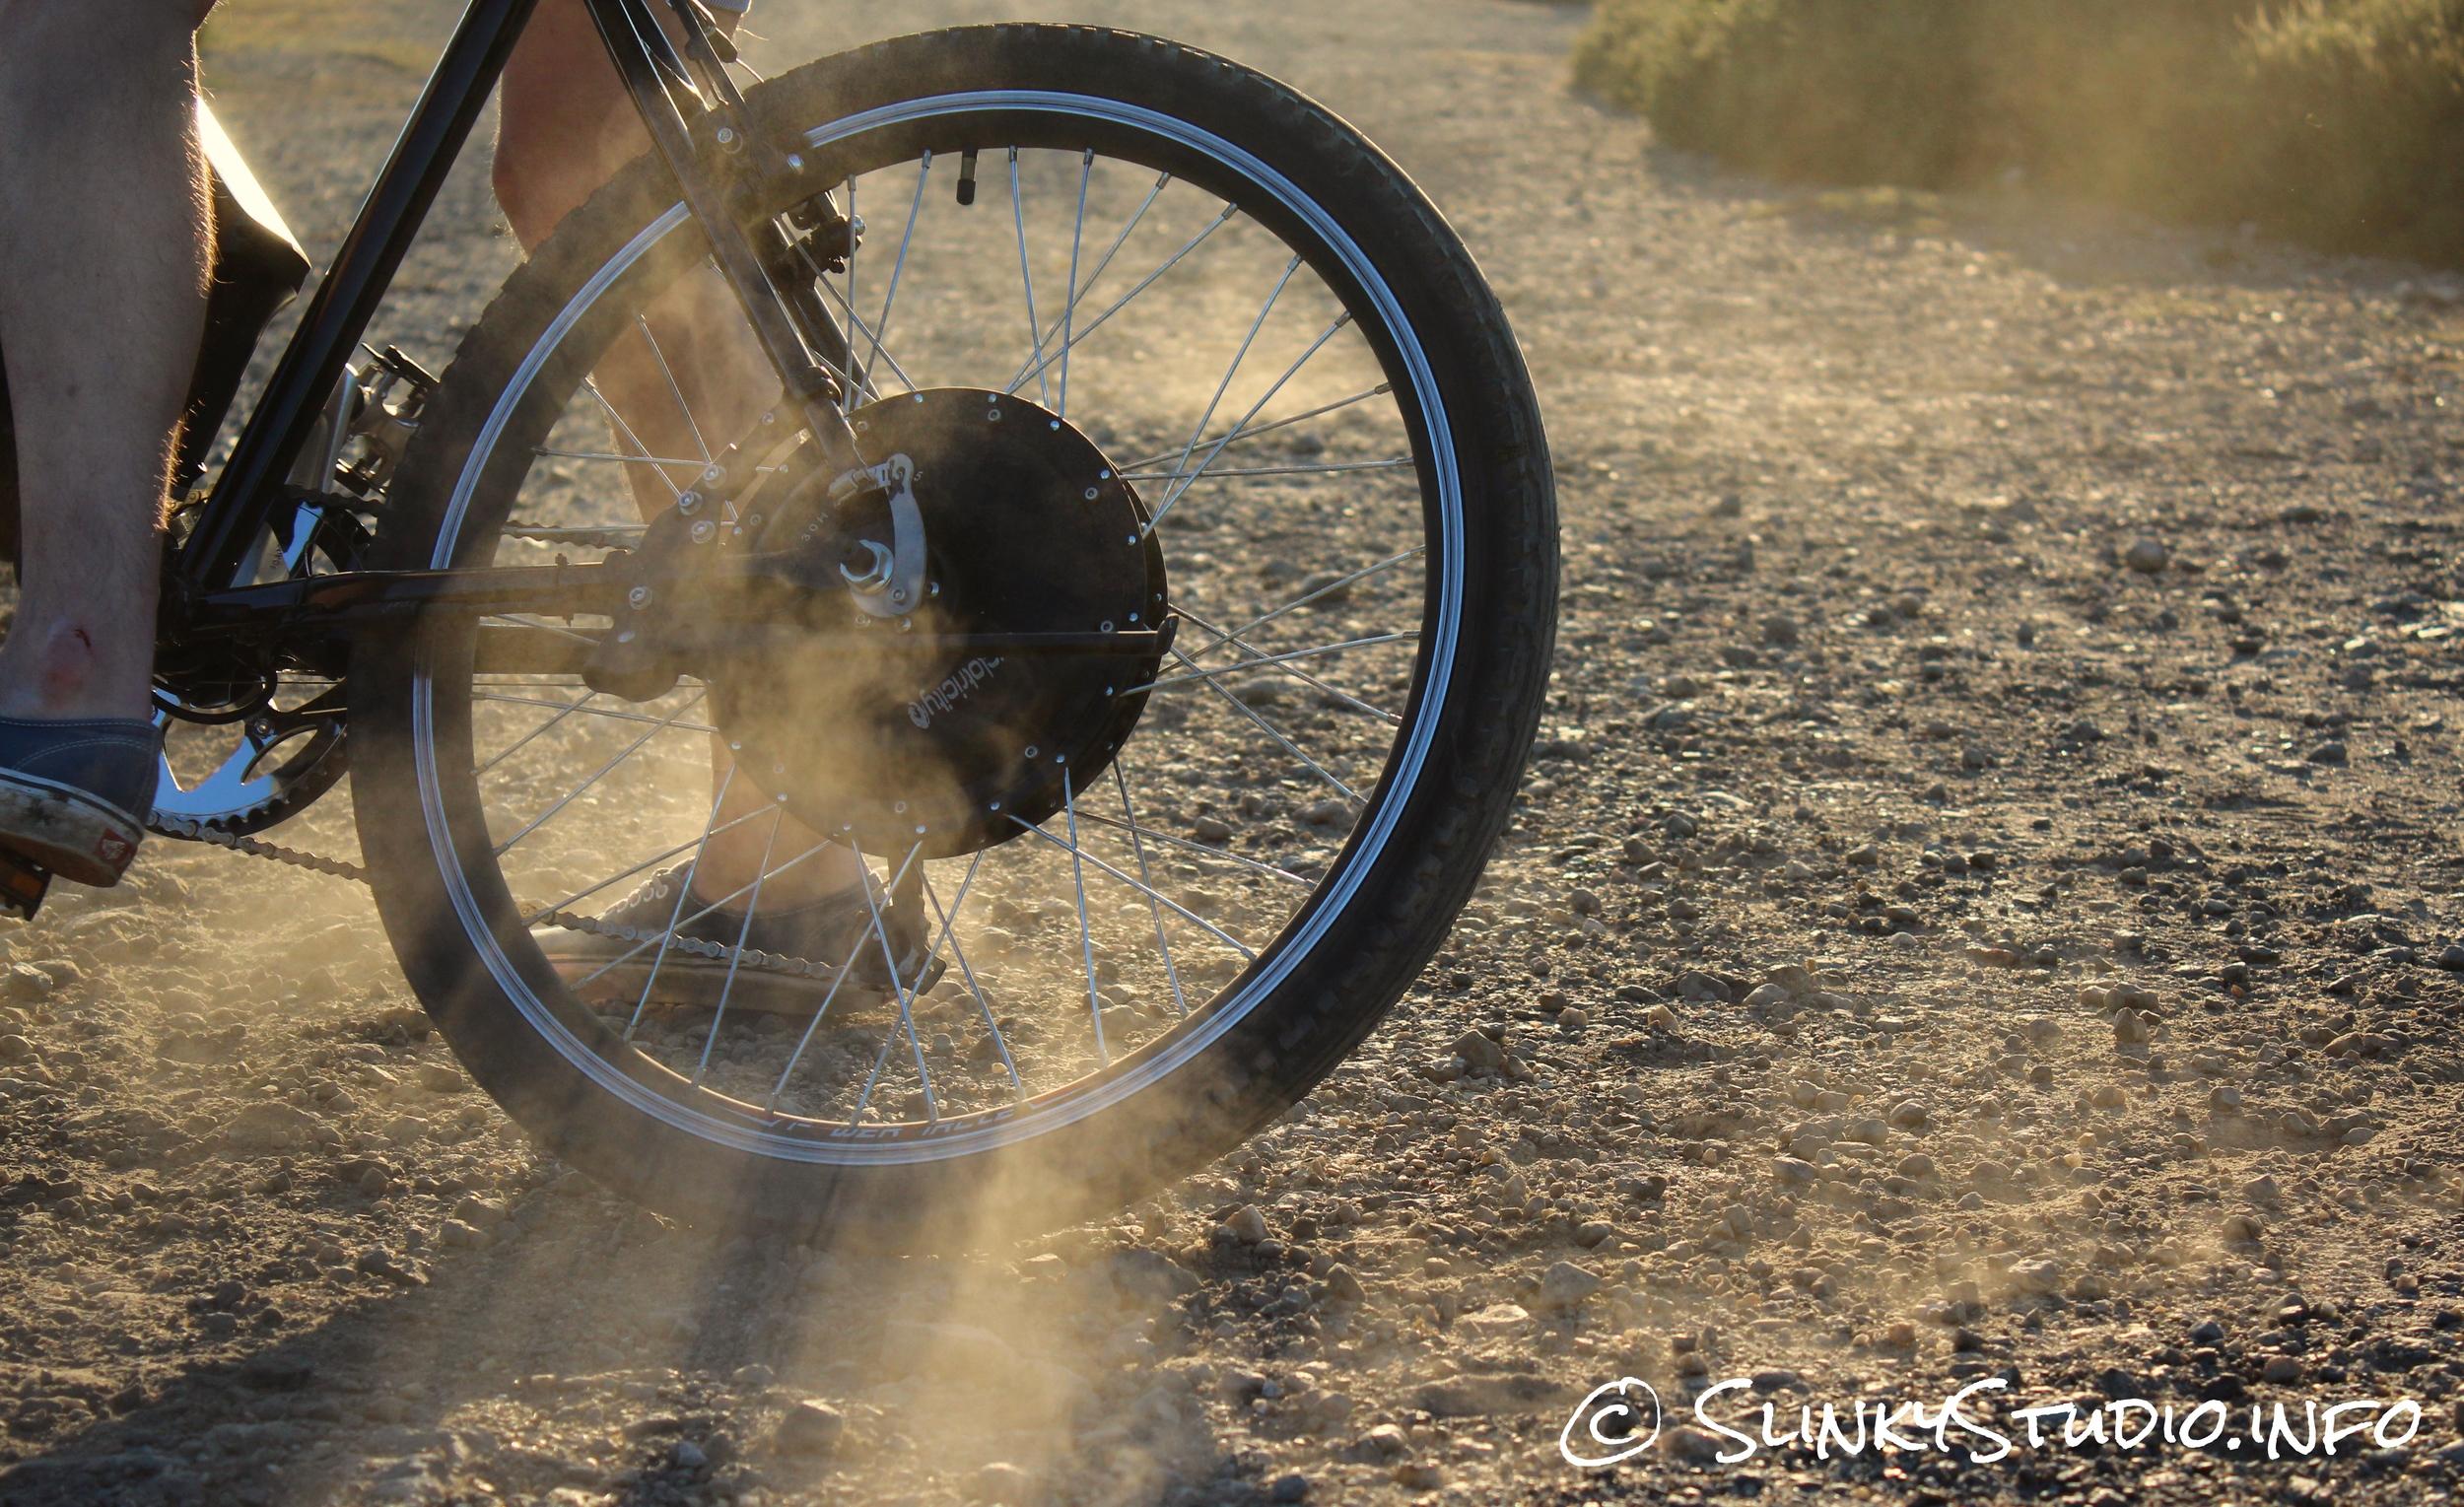 Cyclotricity Revolver 500W eBike Dust Trail